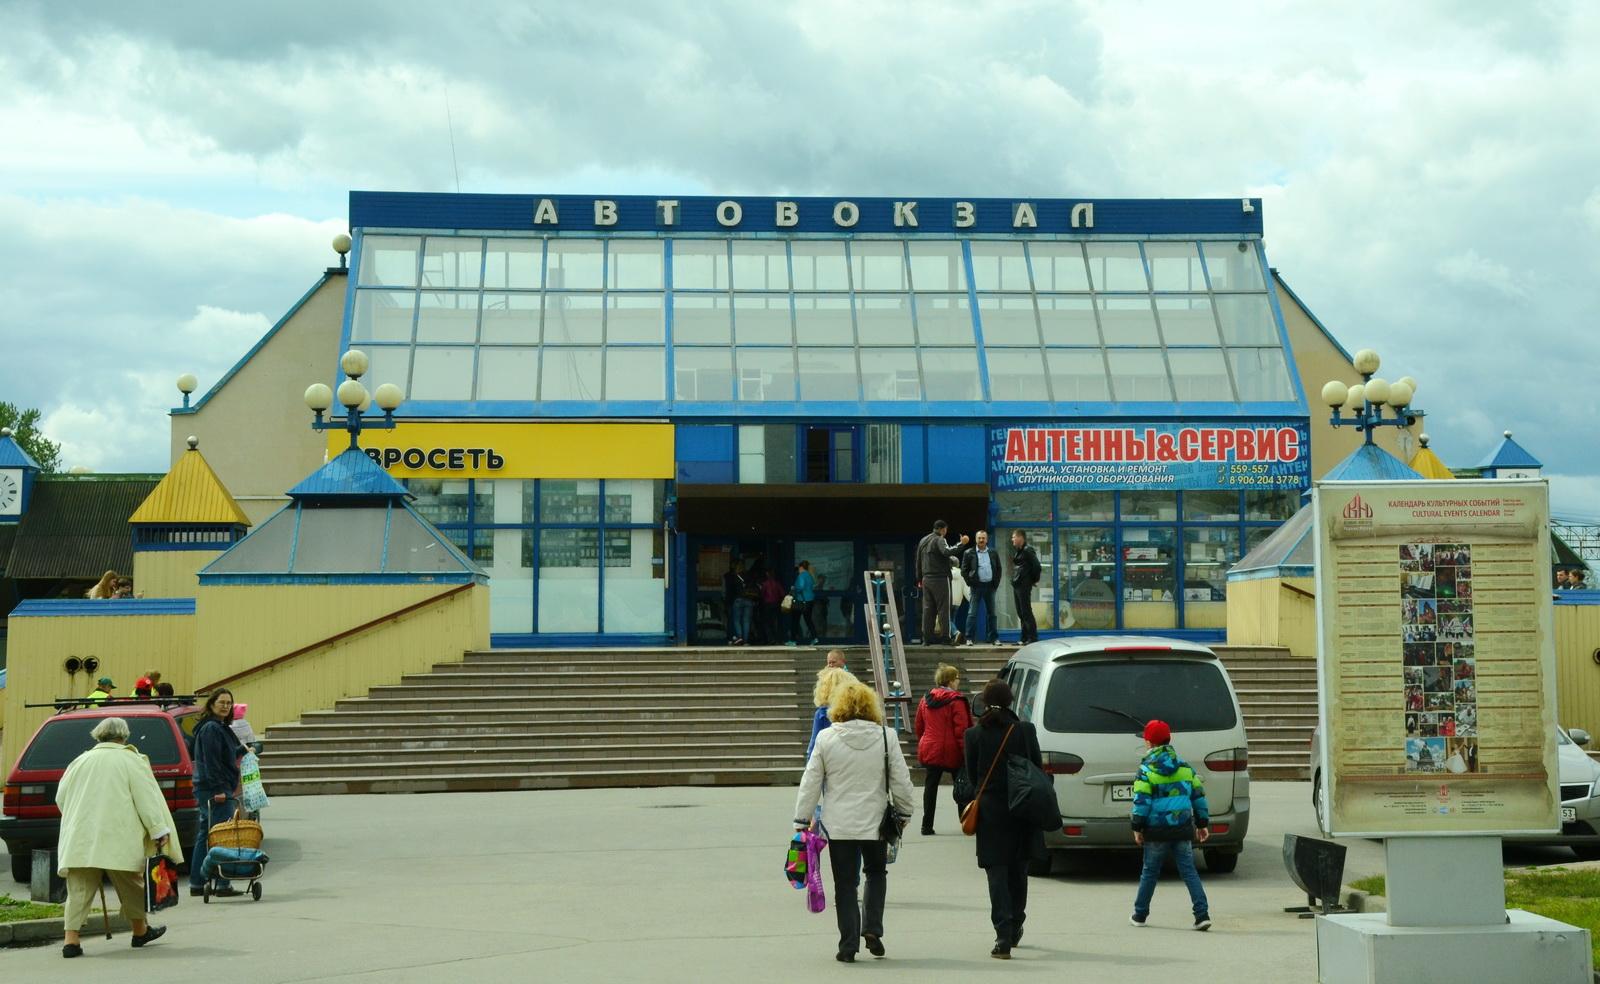 автобус петербург новгород: